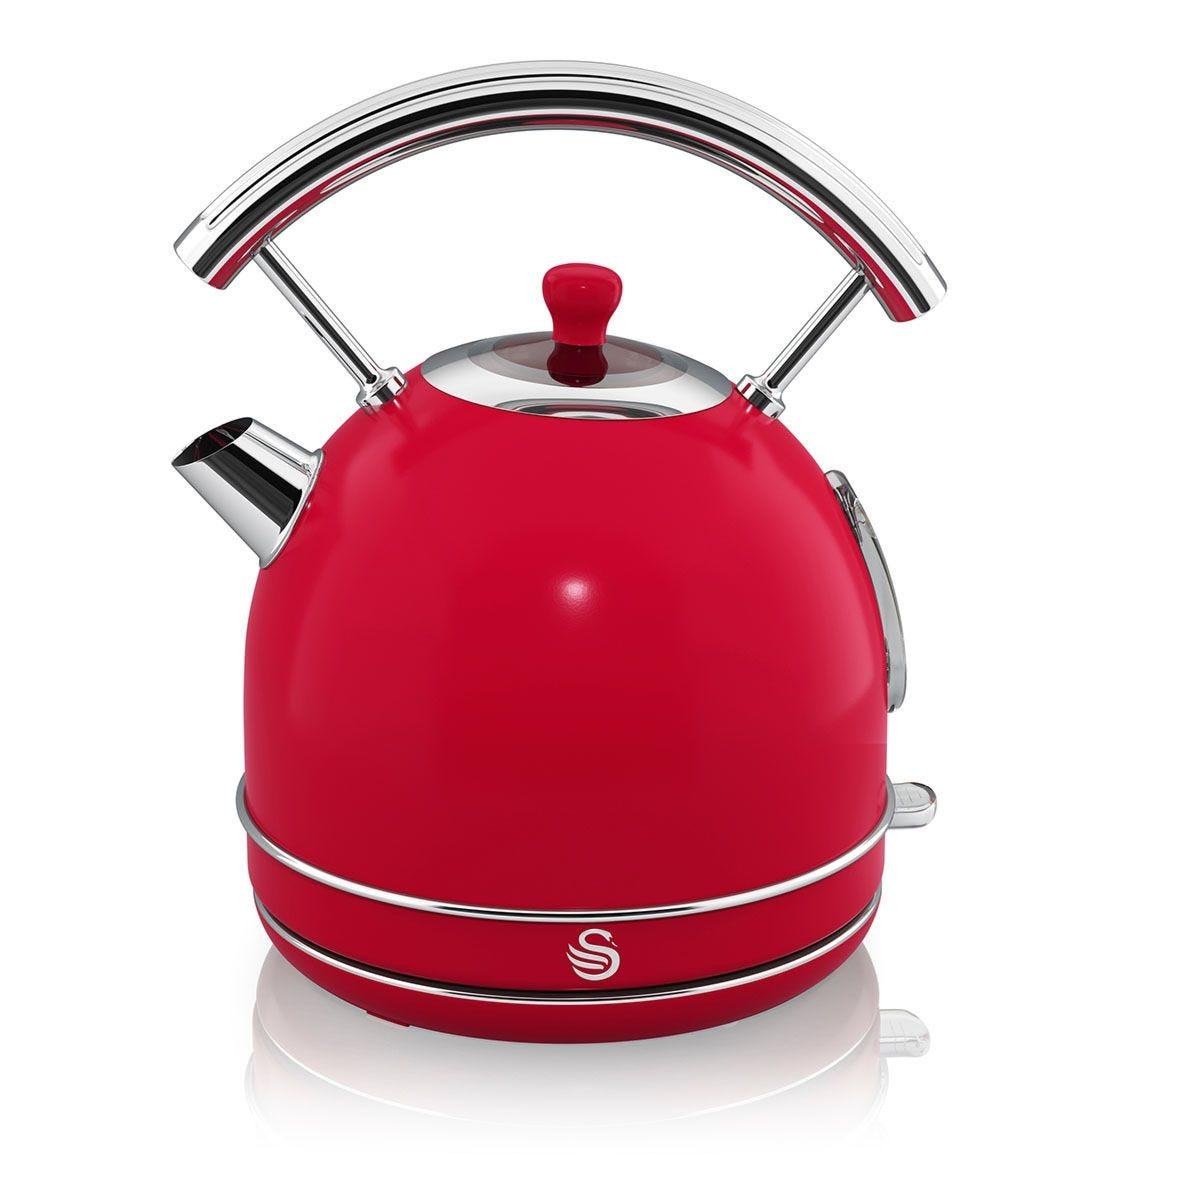 Swan SK14630RN 1.8L 3000W Retro Dome Kettle - Red